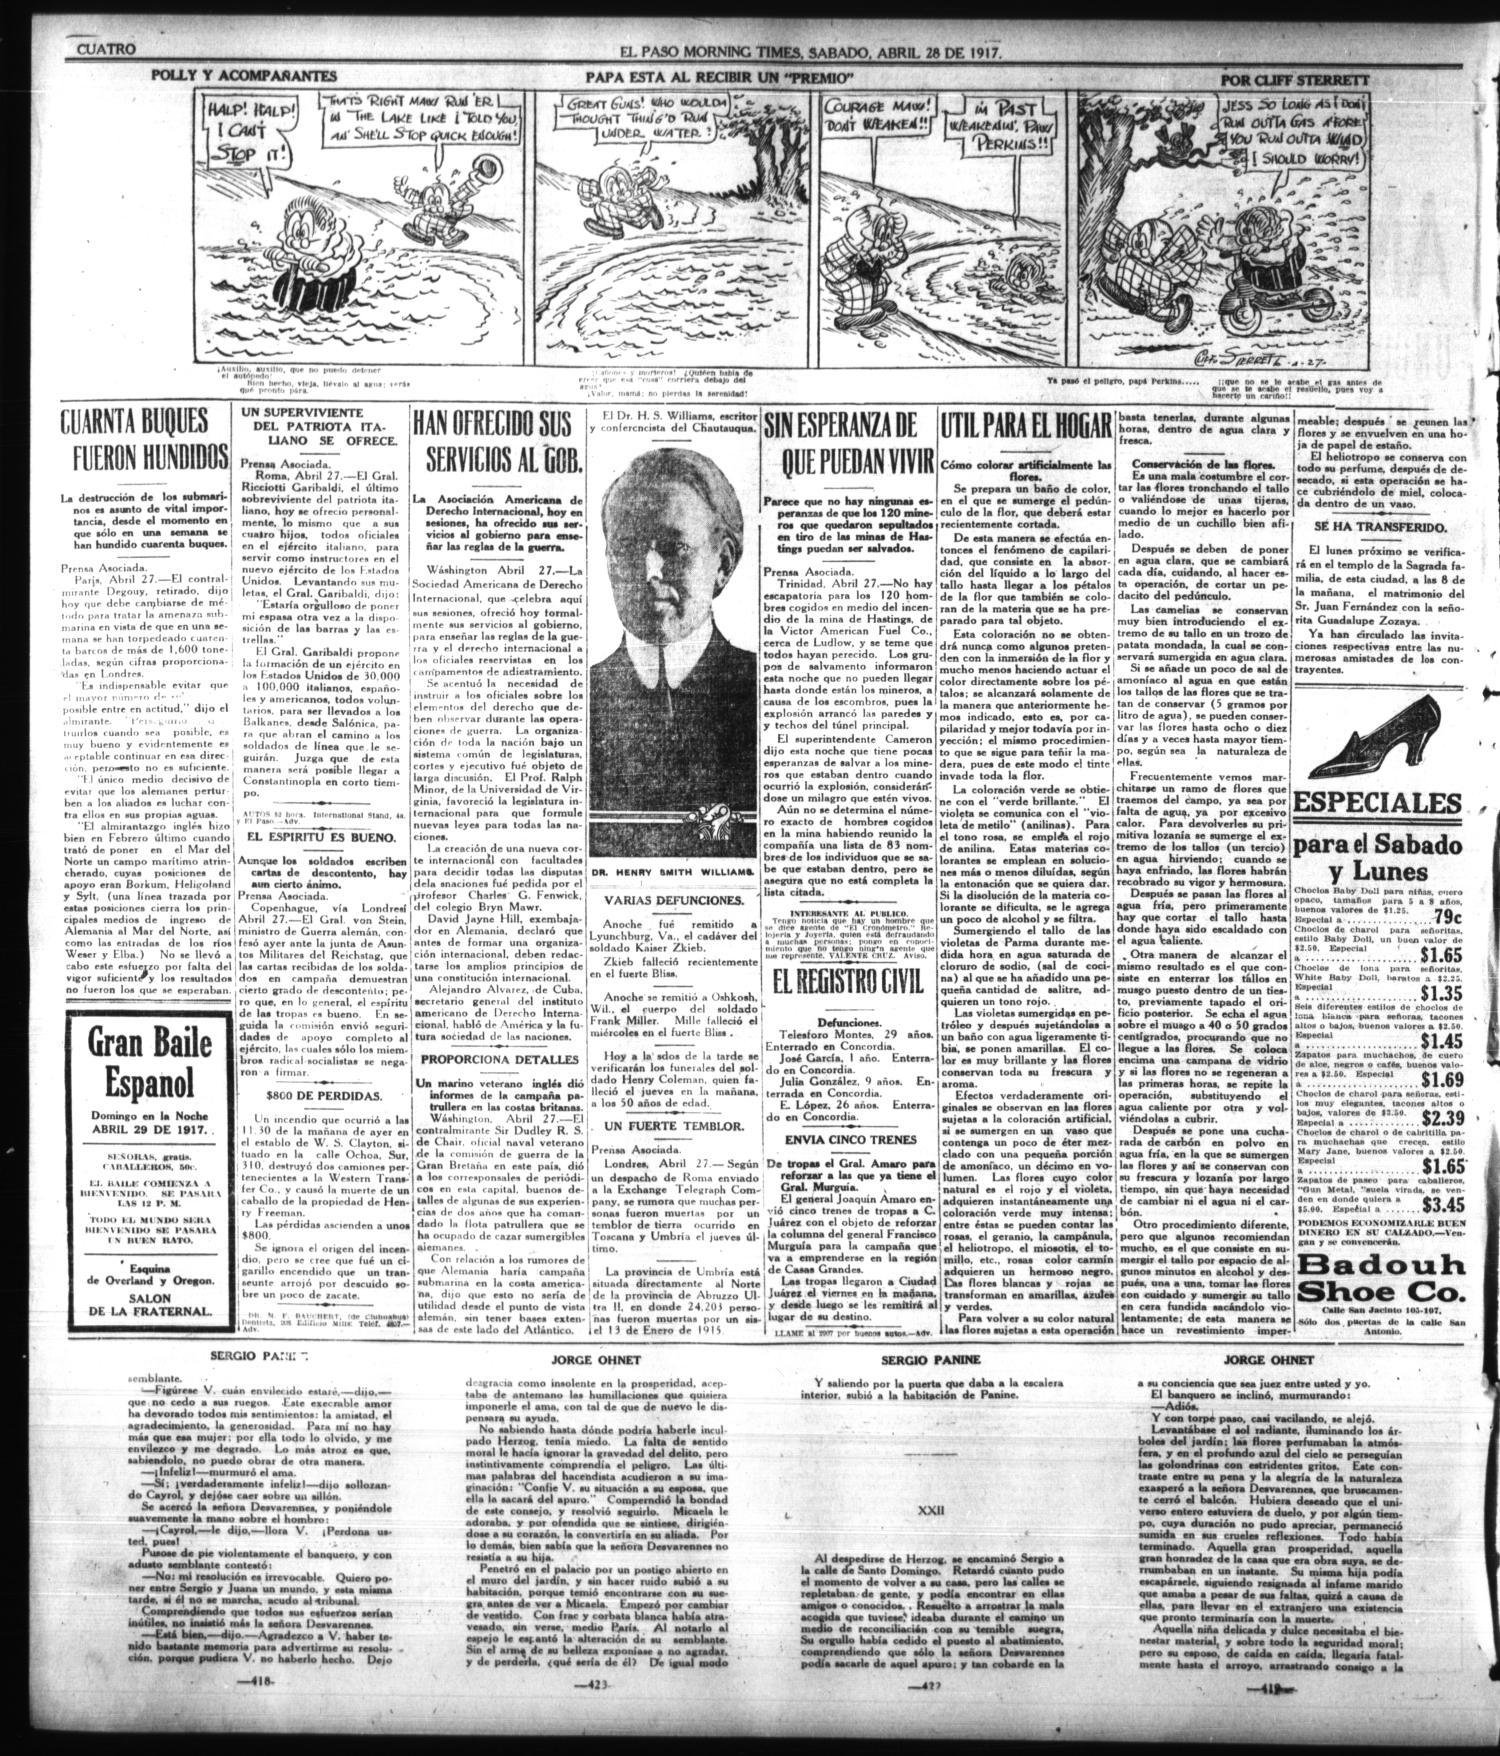 d48ef942a2d476 El Paso Morning Times (El Paso, Tex.), Vol. 36TH YEAR, Ed. 1, Saturday,  April 28, 1917 - Page 4 of 4 - The Portal to Texas History